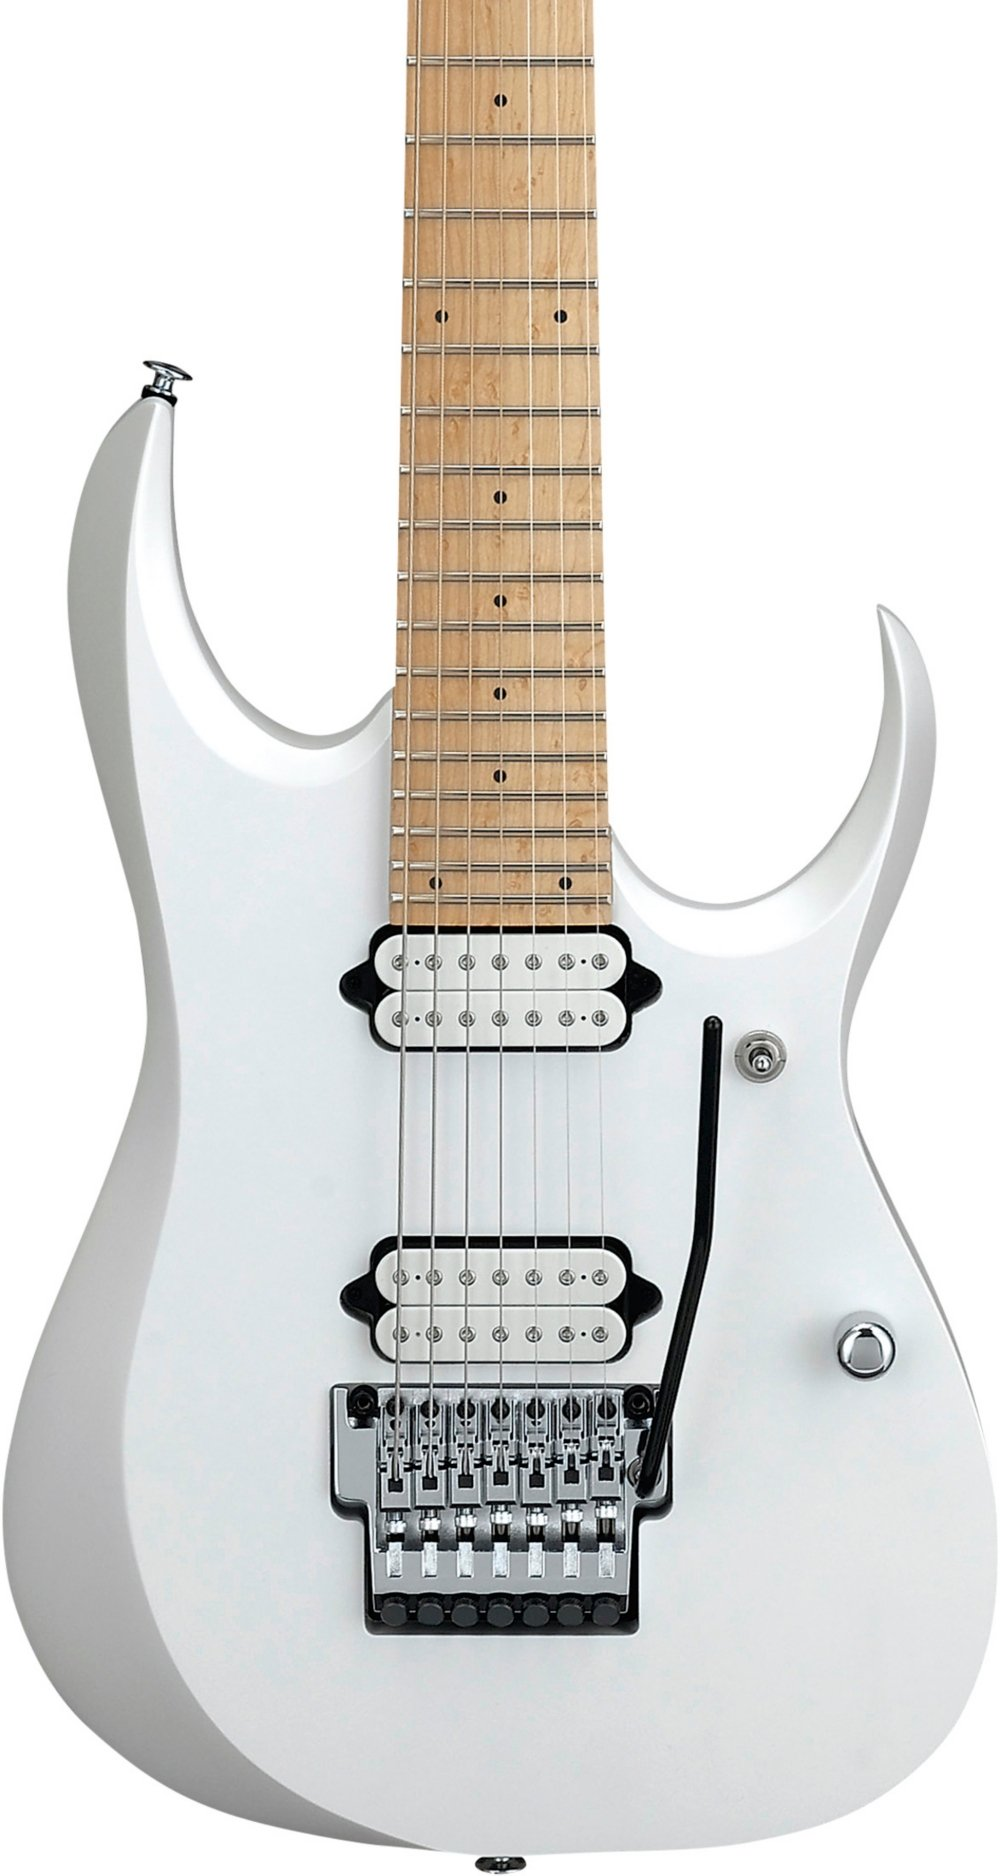 Cheap Ibanez RGD Prestige 7-String Electric Guitar Satin Pearl White Black Friday & Cyber Monday 2019